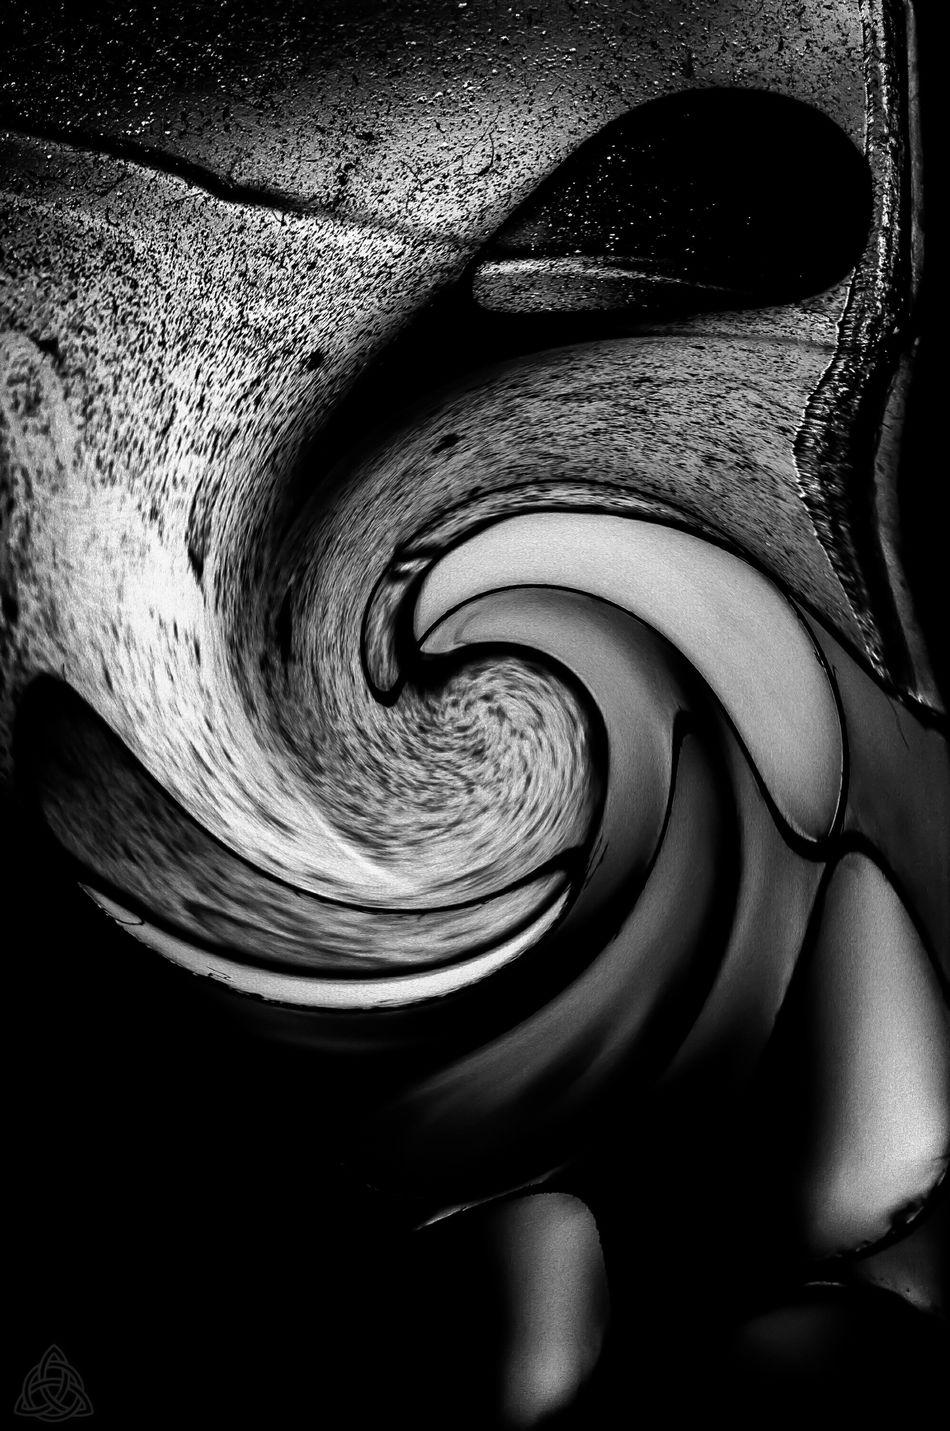 Wave... EyeEm Market © From My Point Of View Cut And Paste EyeEm Best Edits Eyem Best Shots Eyembestpics Eyemphotography Backgrounds EyeEm Gallery EyeEm Masterclass Eyem Collection EyeEm Best Shots Tranquility Eyeemphoto Abstract